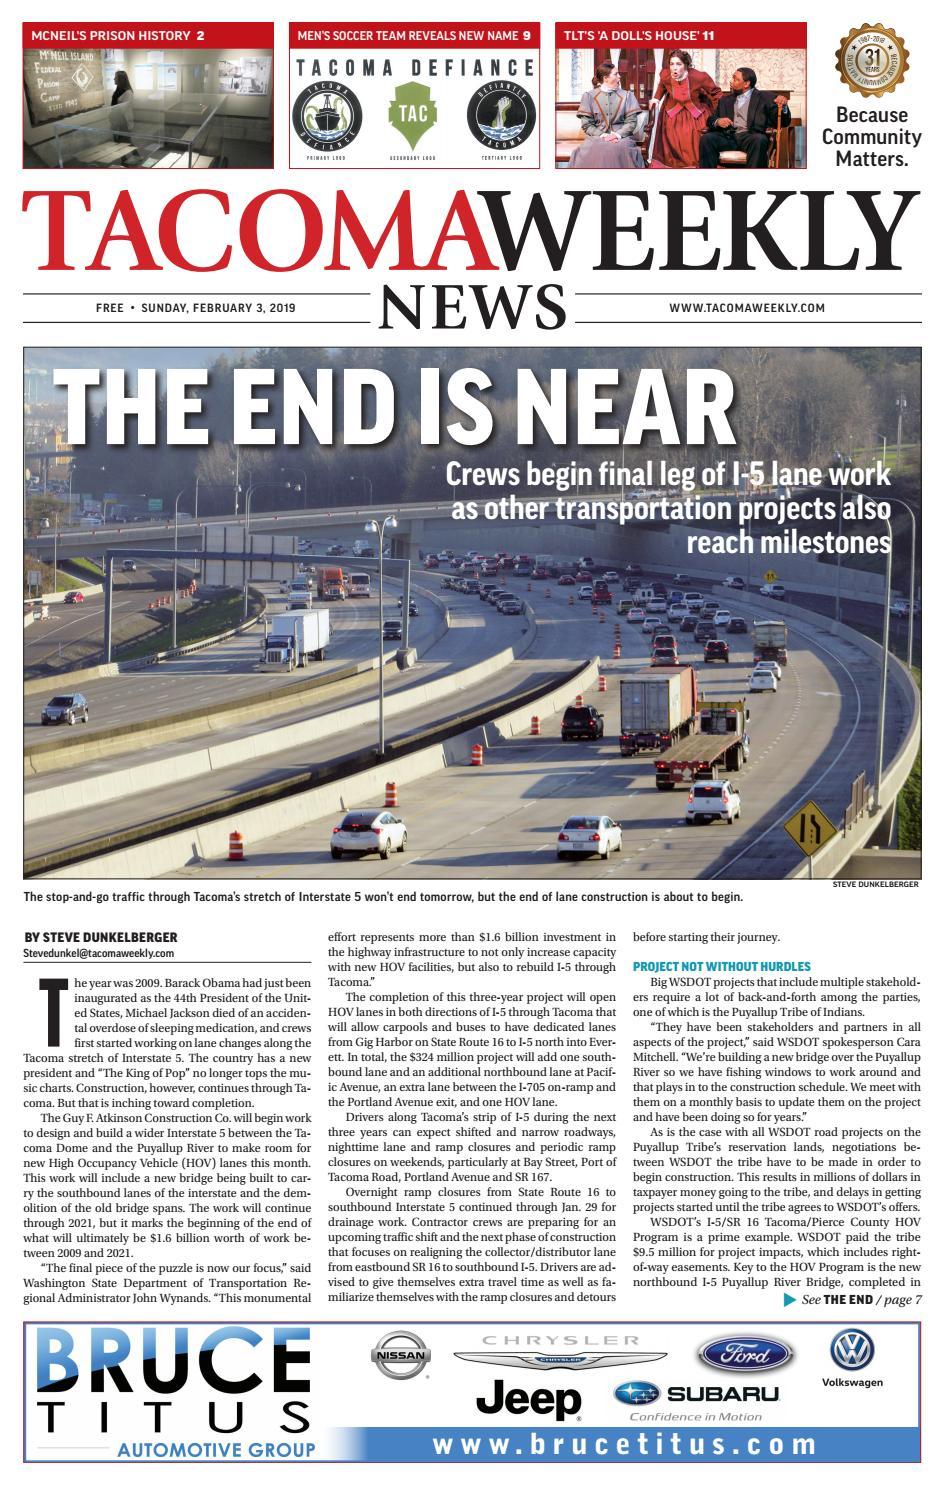 Tacoma Weekly 02 03 19 by Tacoma Weekly News - issuu